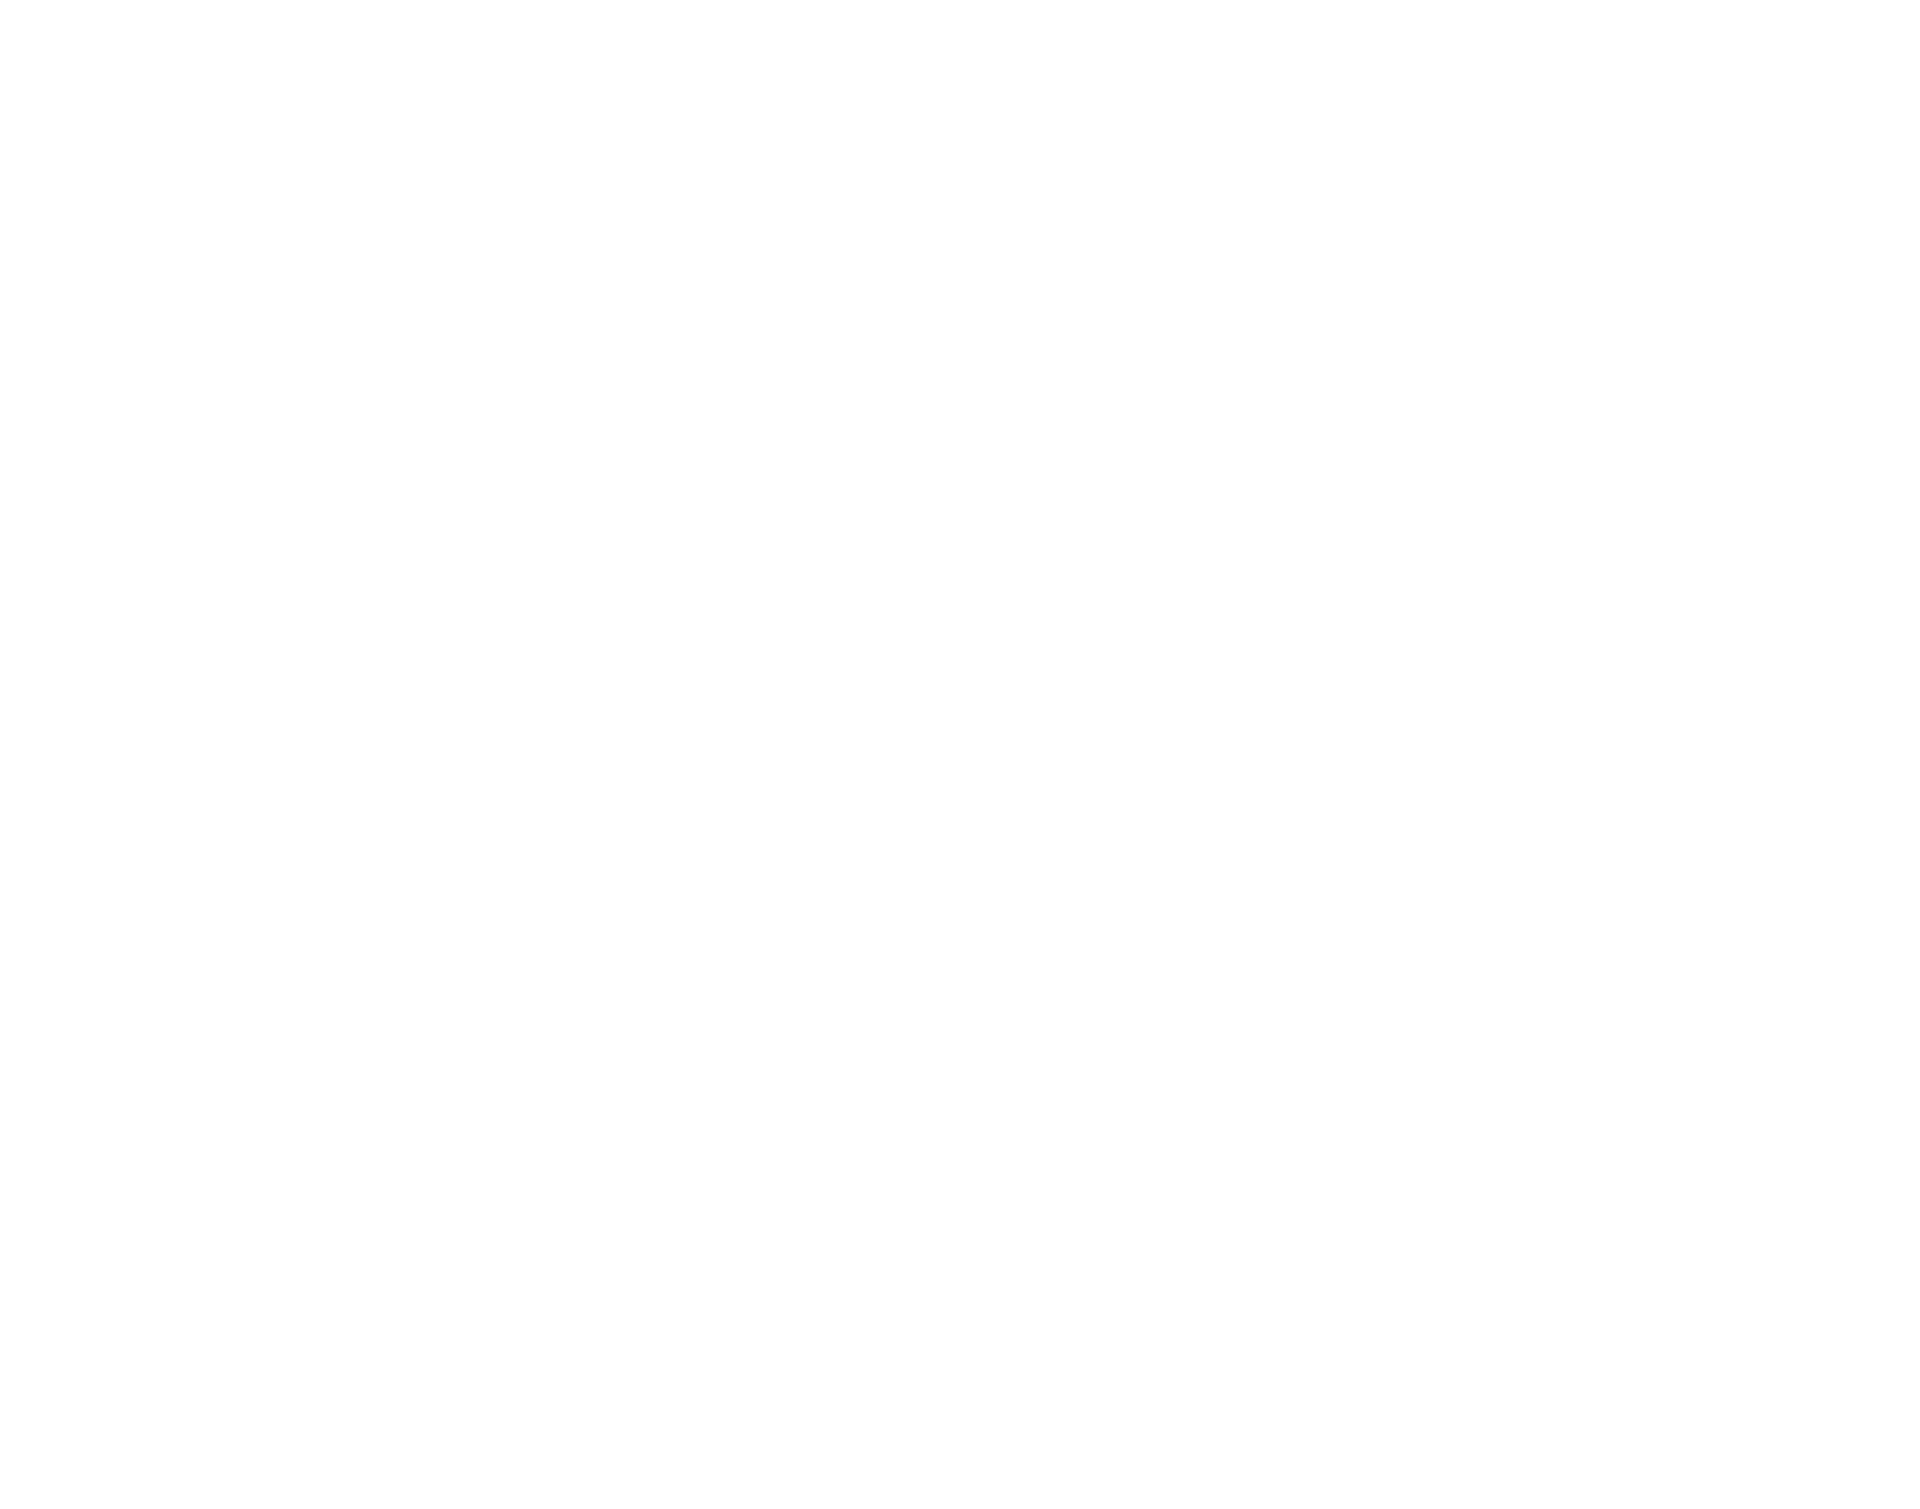 Oremandsgaard Kammermusikfest Kammermusikfest 2017